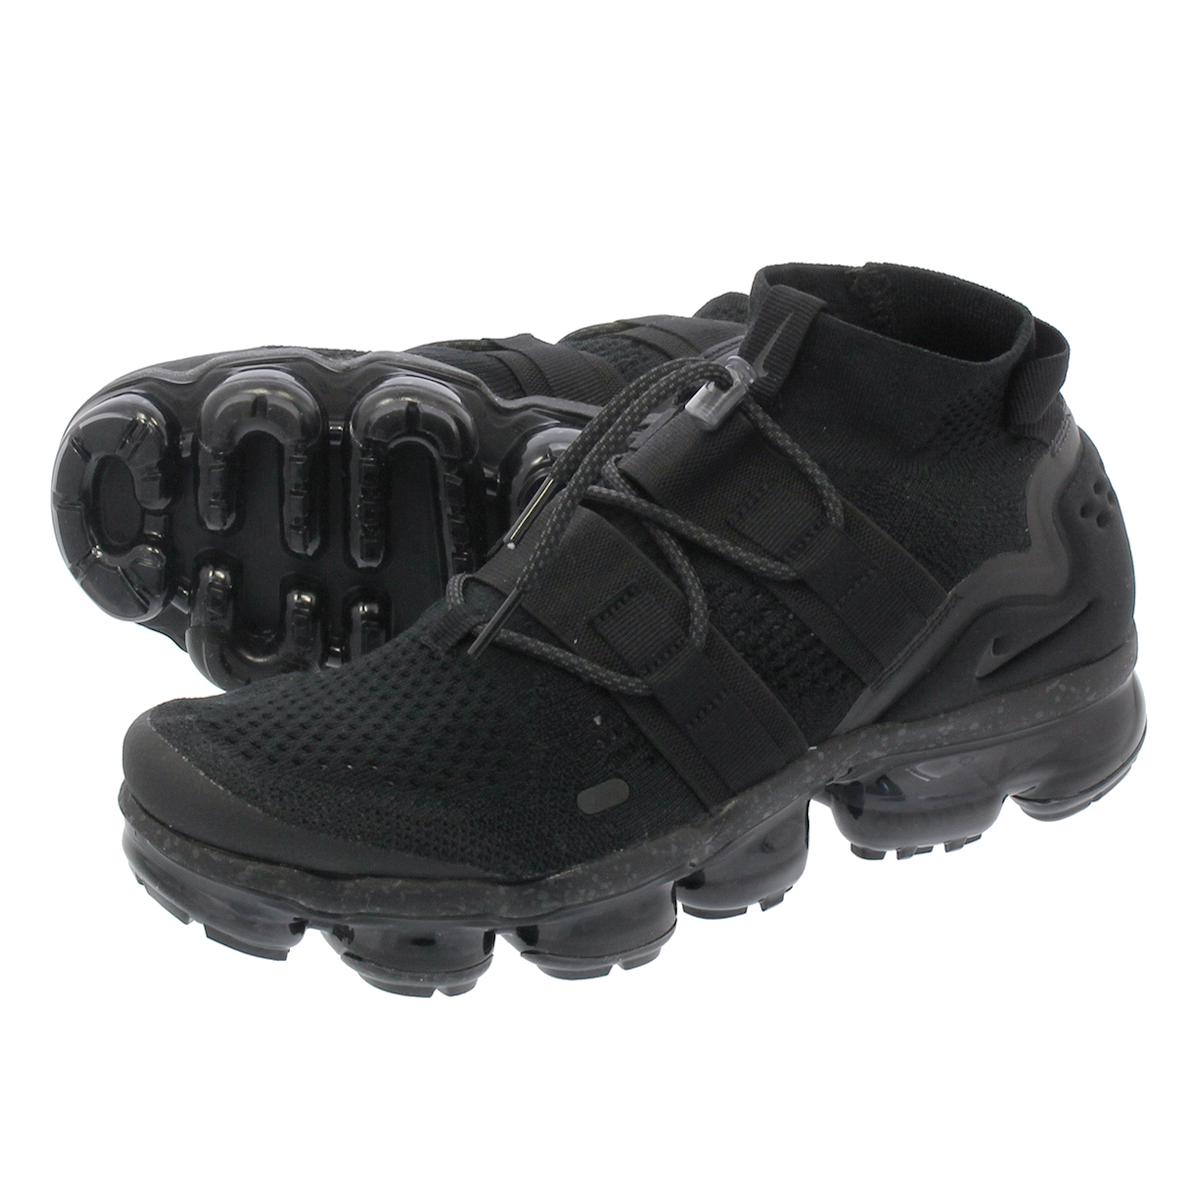 084a57886cab42 LOWTEX PLUS  NIKE AIR VAPORMAX FLYKNIT UTILITY Nike vapor max fried food  knit utility BLACK BLACK BLACK